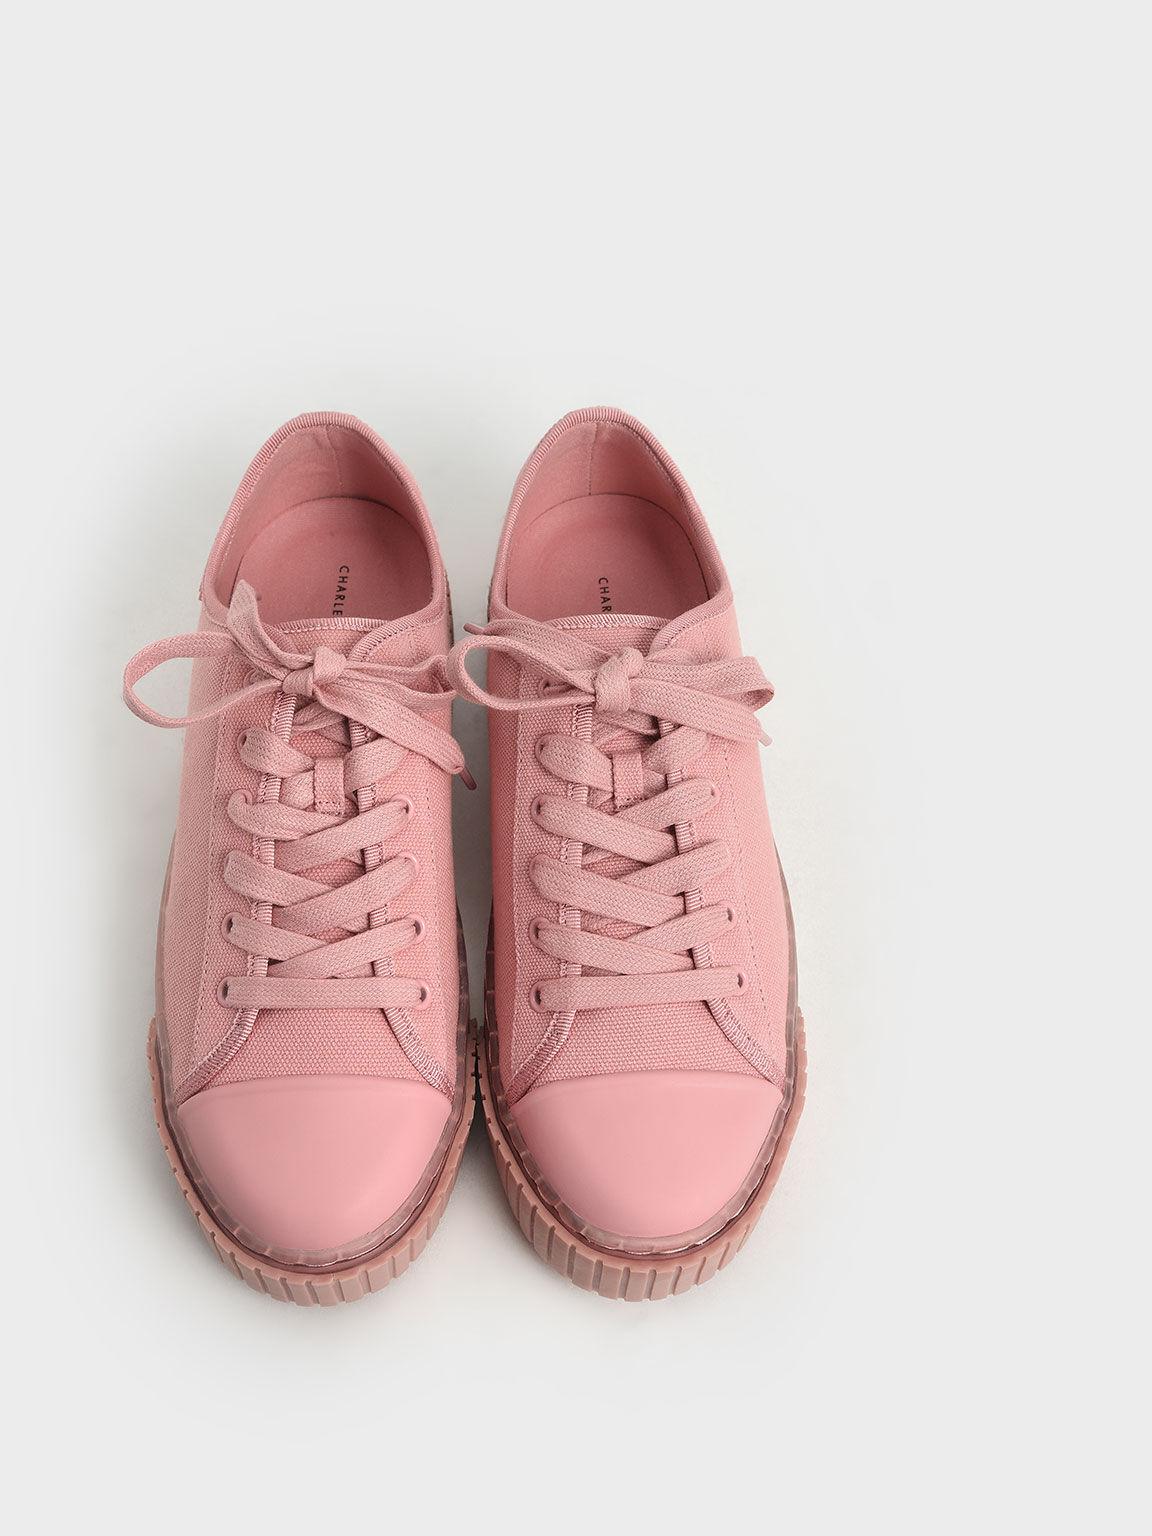 Purpose Collection 2021: Organic Cotton Platform Sneakers, Pink, hi-res